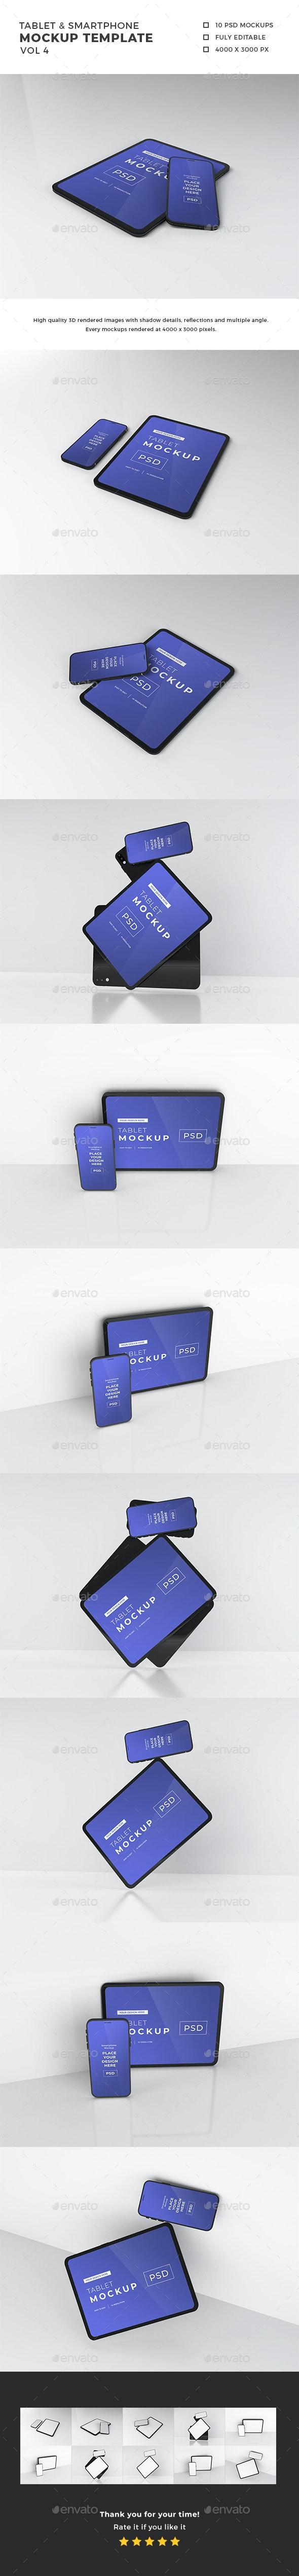 Smartphone and Tablet Mockup Template Vol 4 - Mobile Displays